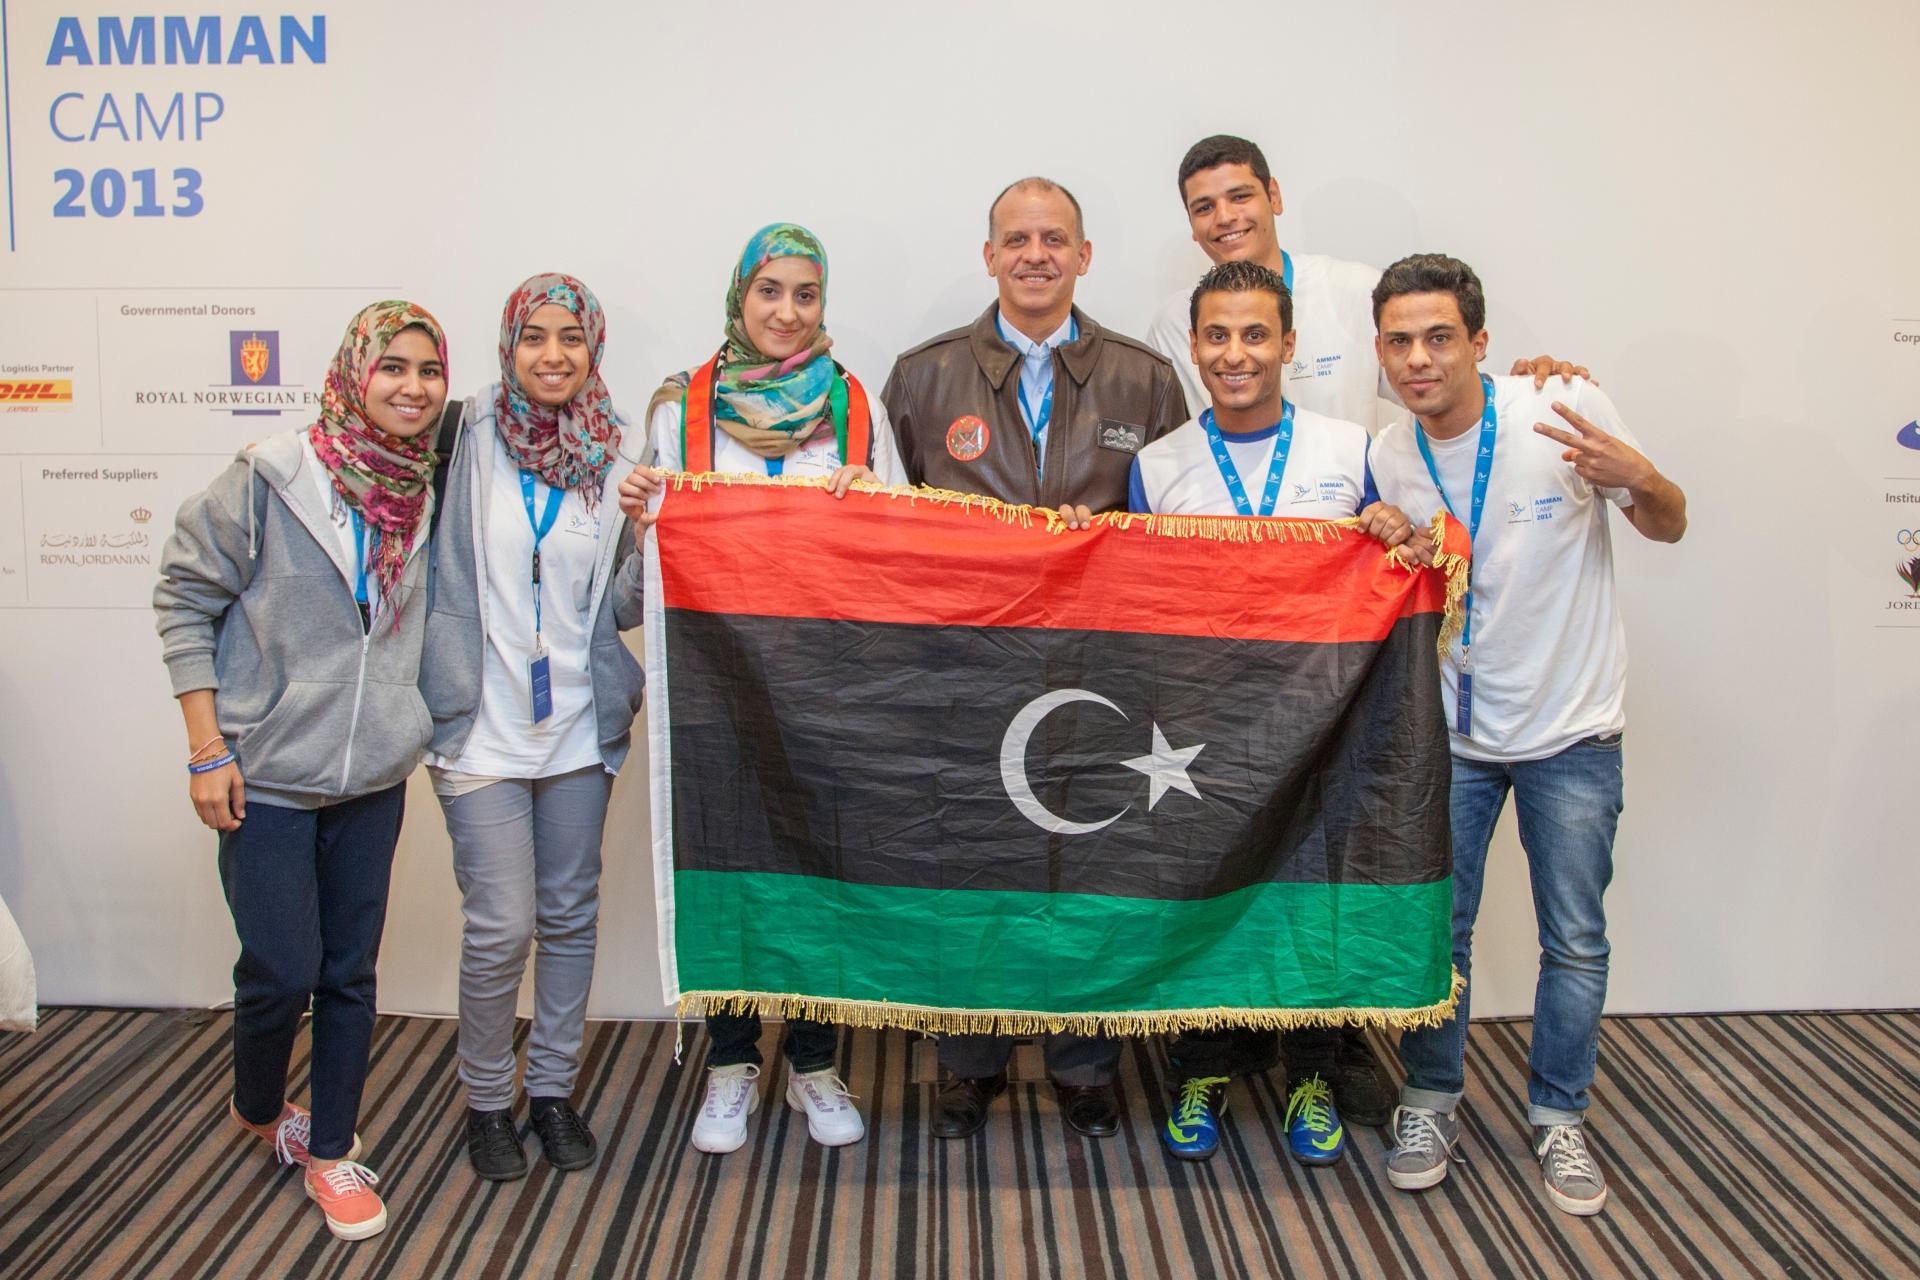 Libyan Delegates, Amman Camp 2013